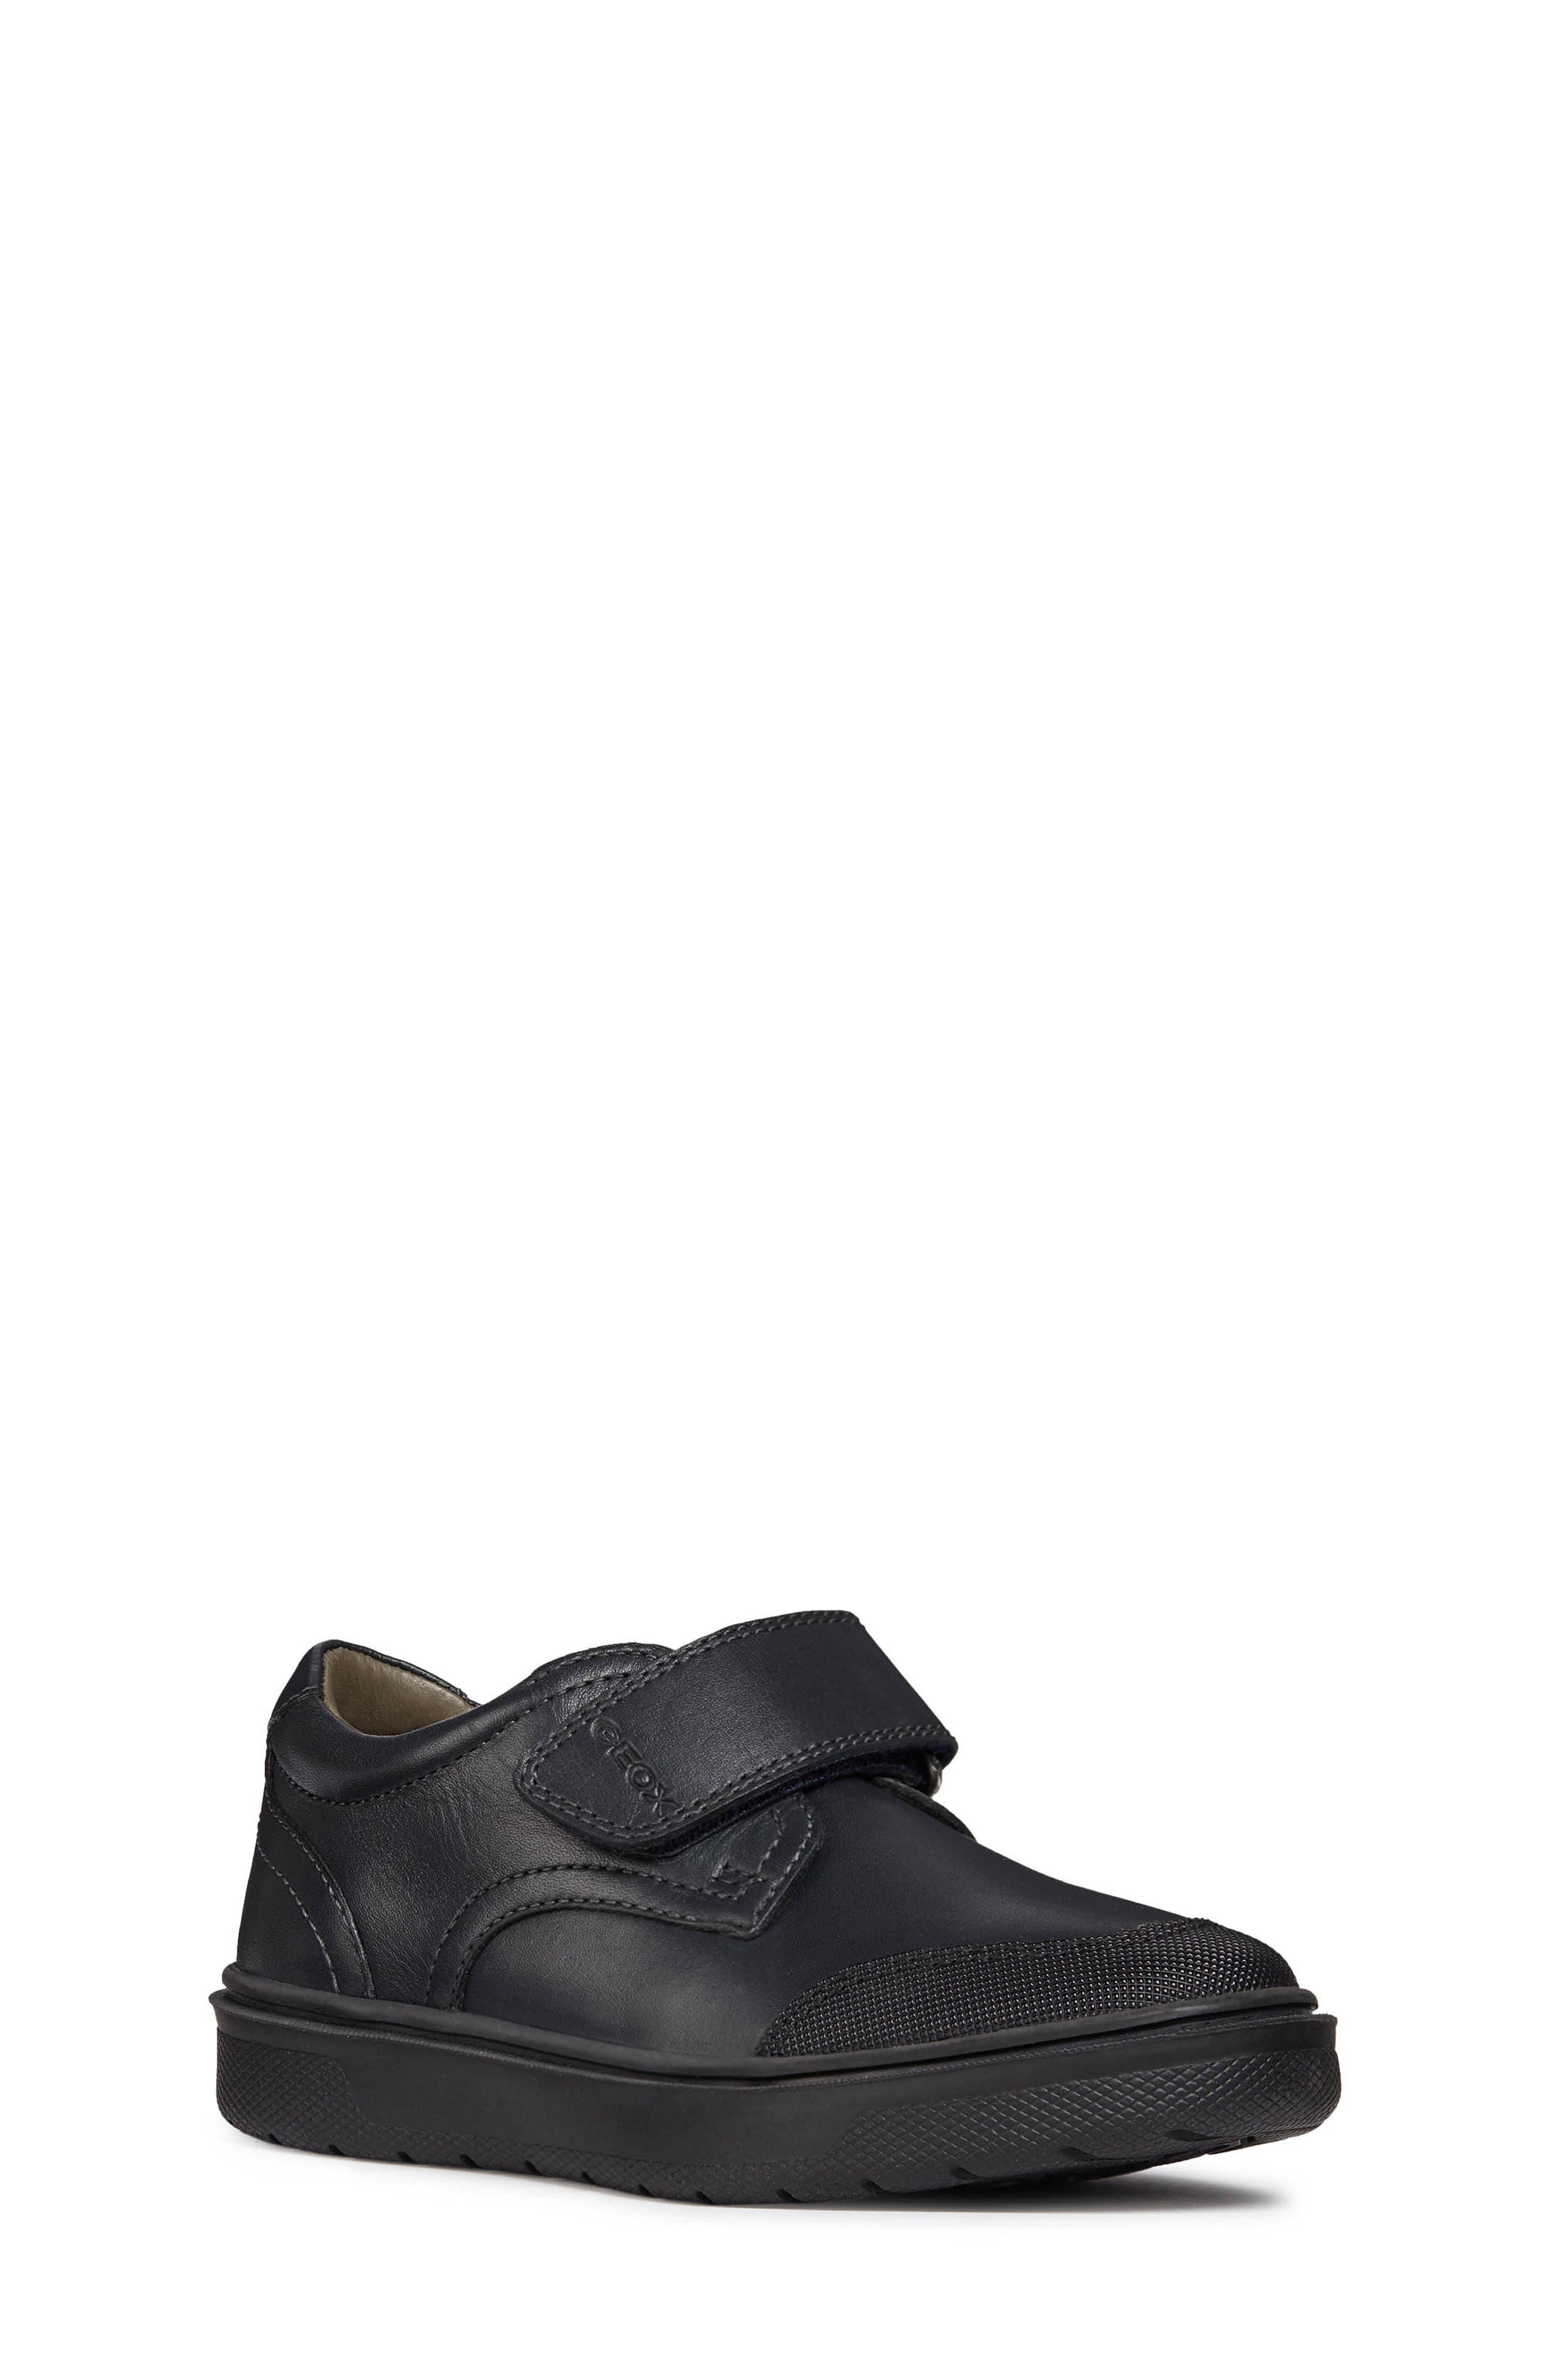 Riddock Loafer,                         Main,                         color, DARK NAVY